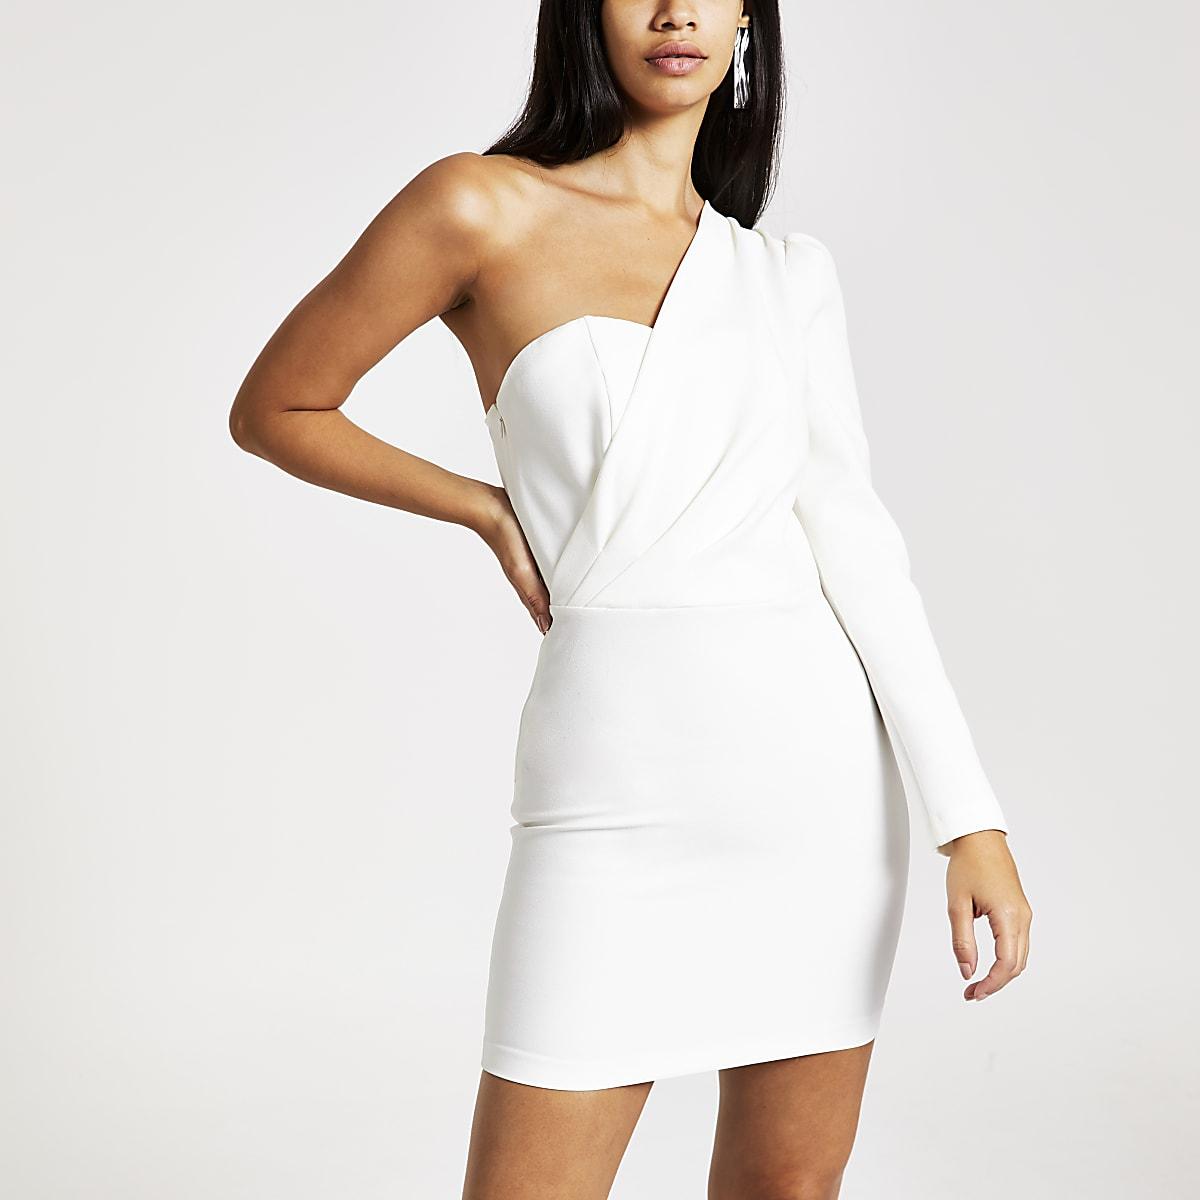 Sleeve Mini Bodycon White One Dress yIvYb7mf6g